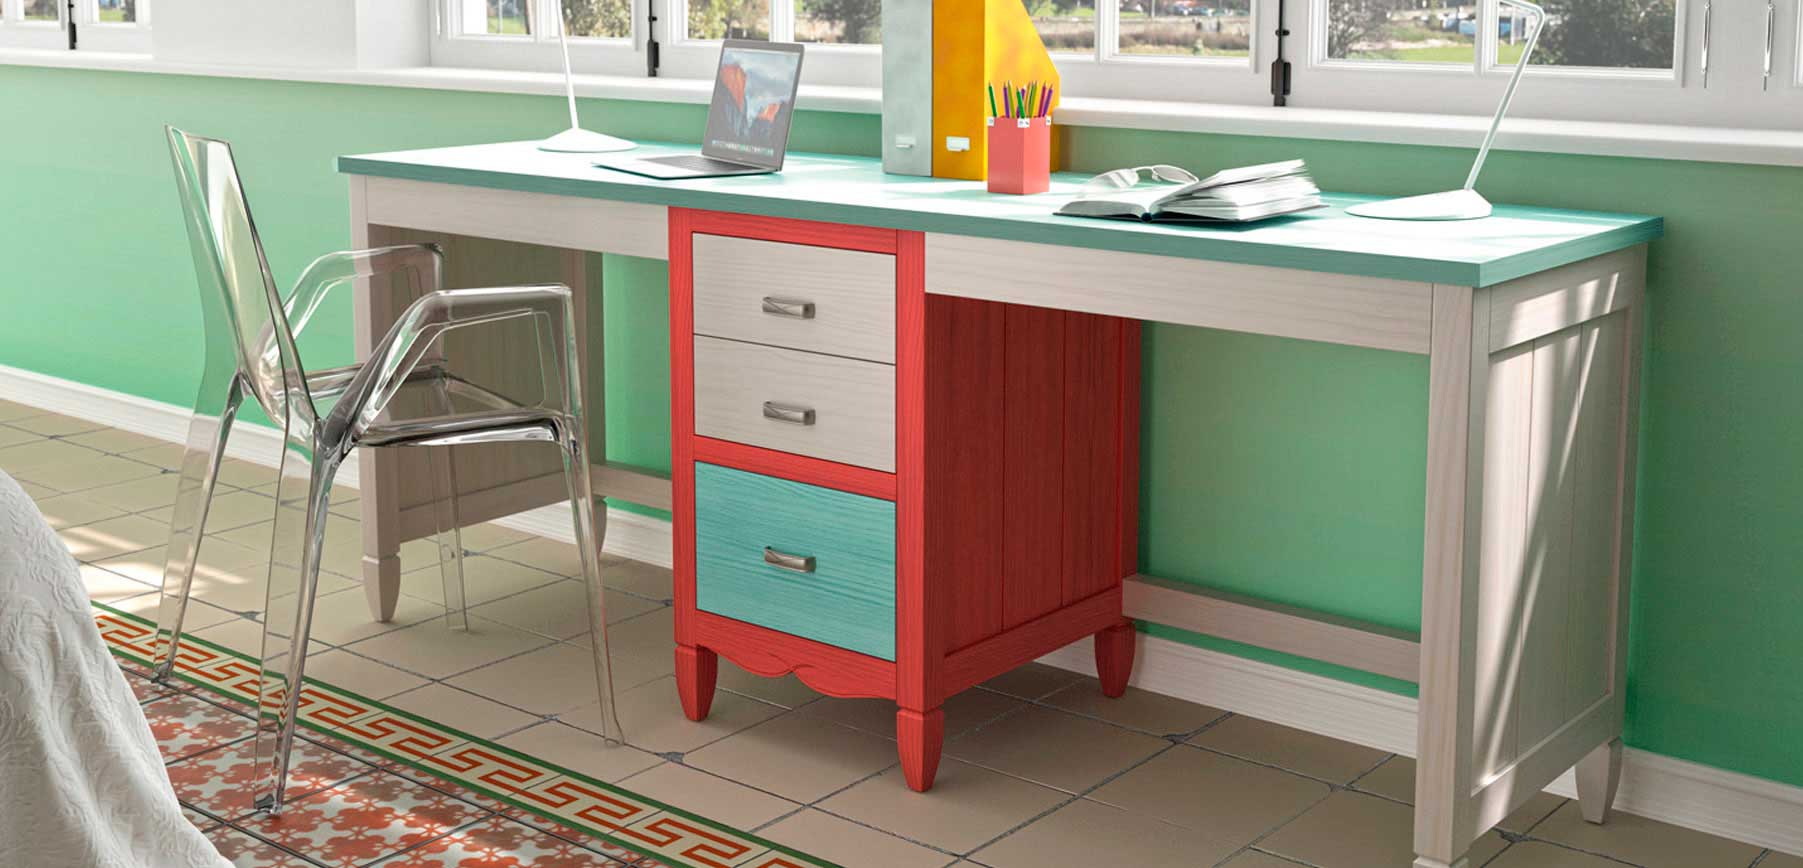 Muebles GRUPOSEYS - Muebles | Furniture | Meubles | мебель seys-6-optim Inicio